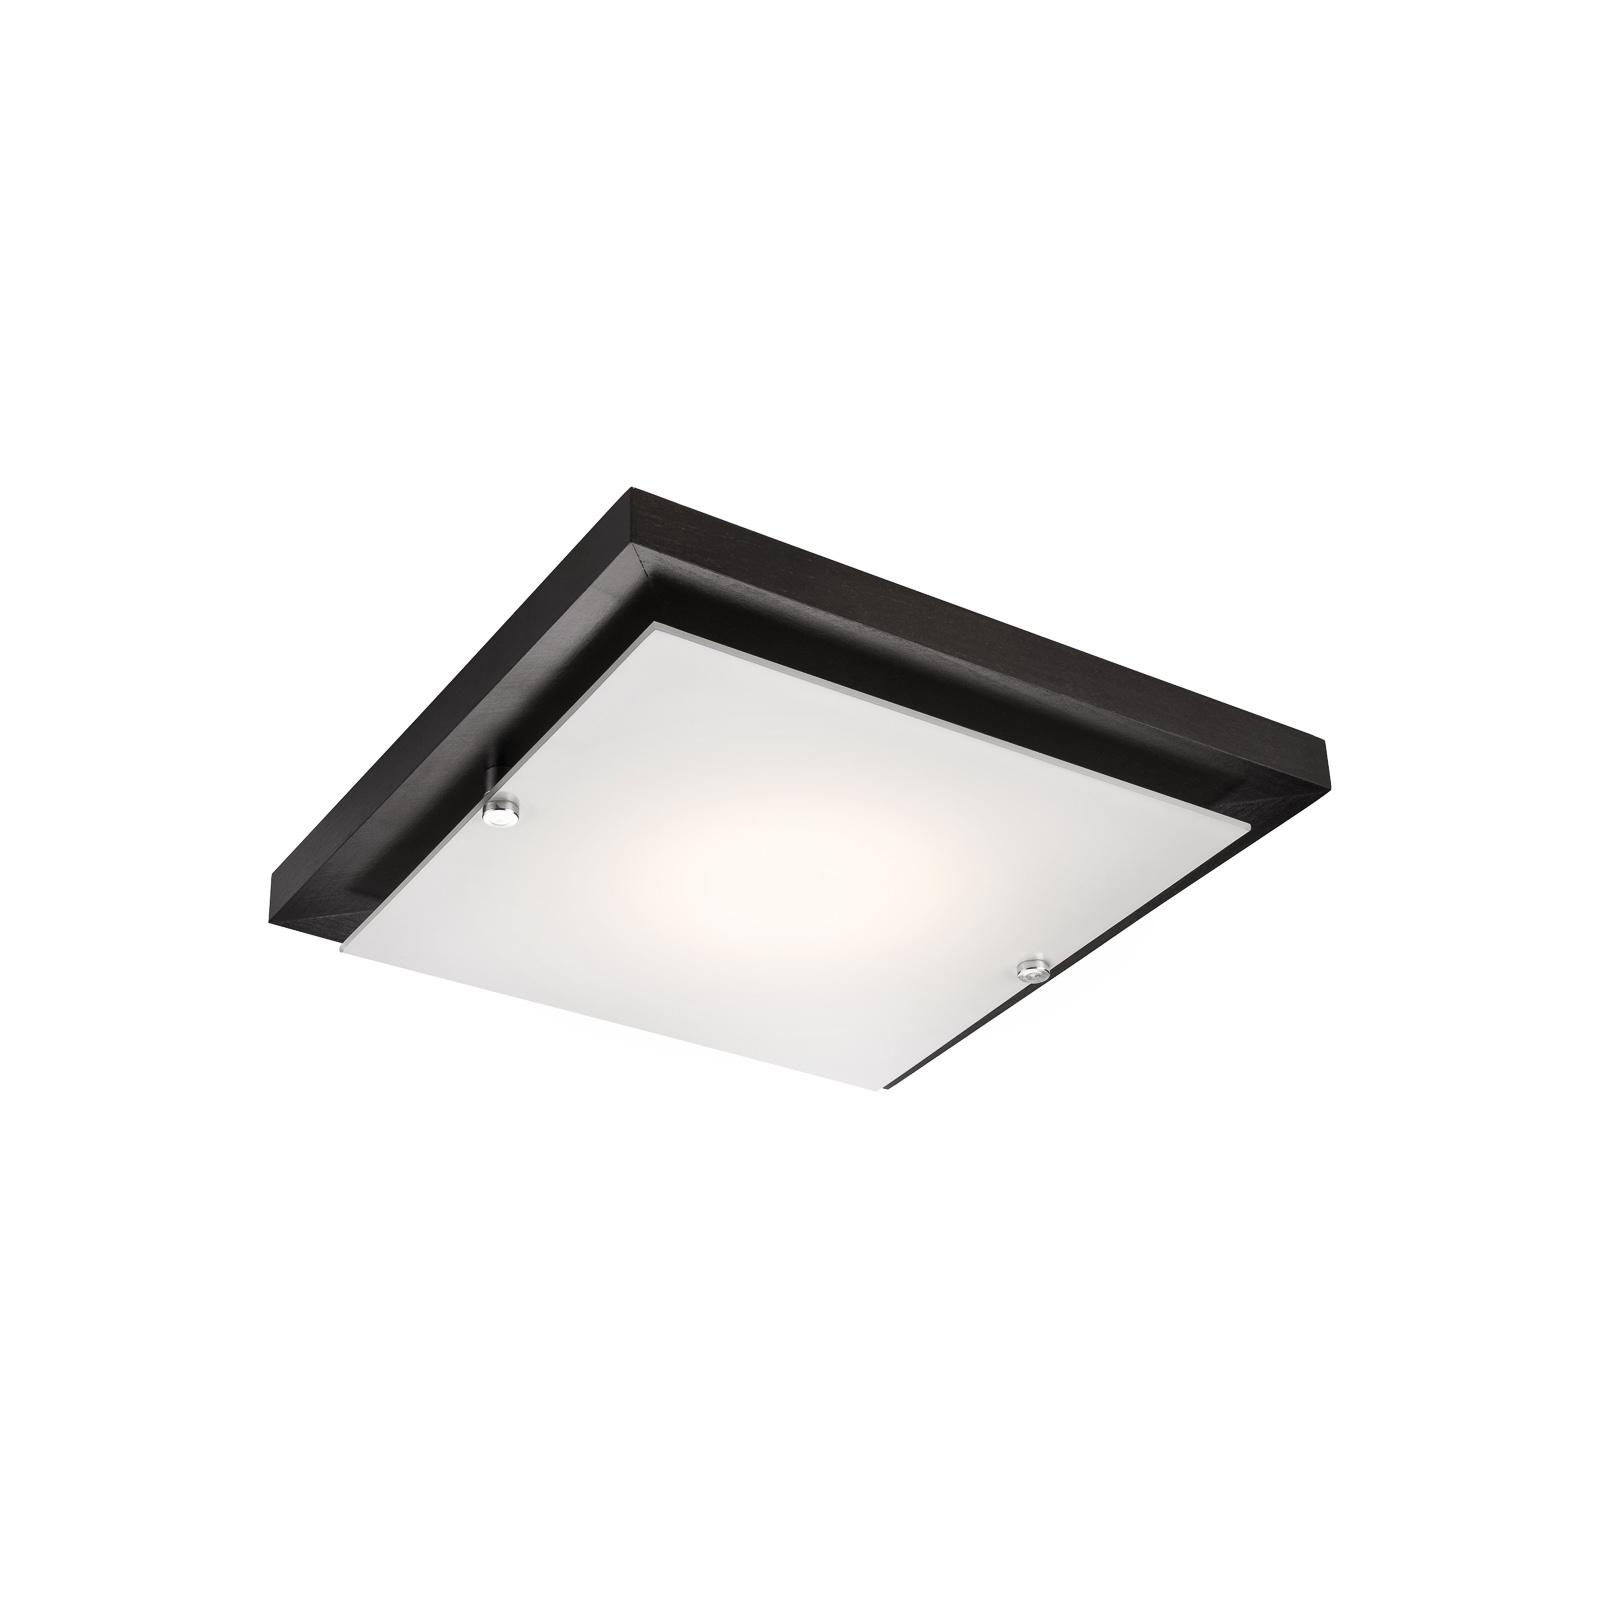 Deckenlampe Kerio, 30x30 cm, wenge